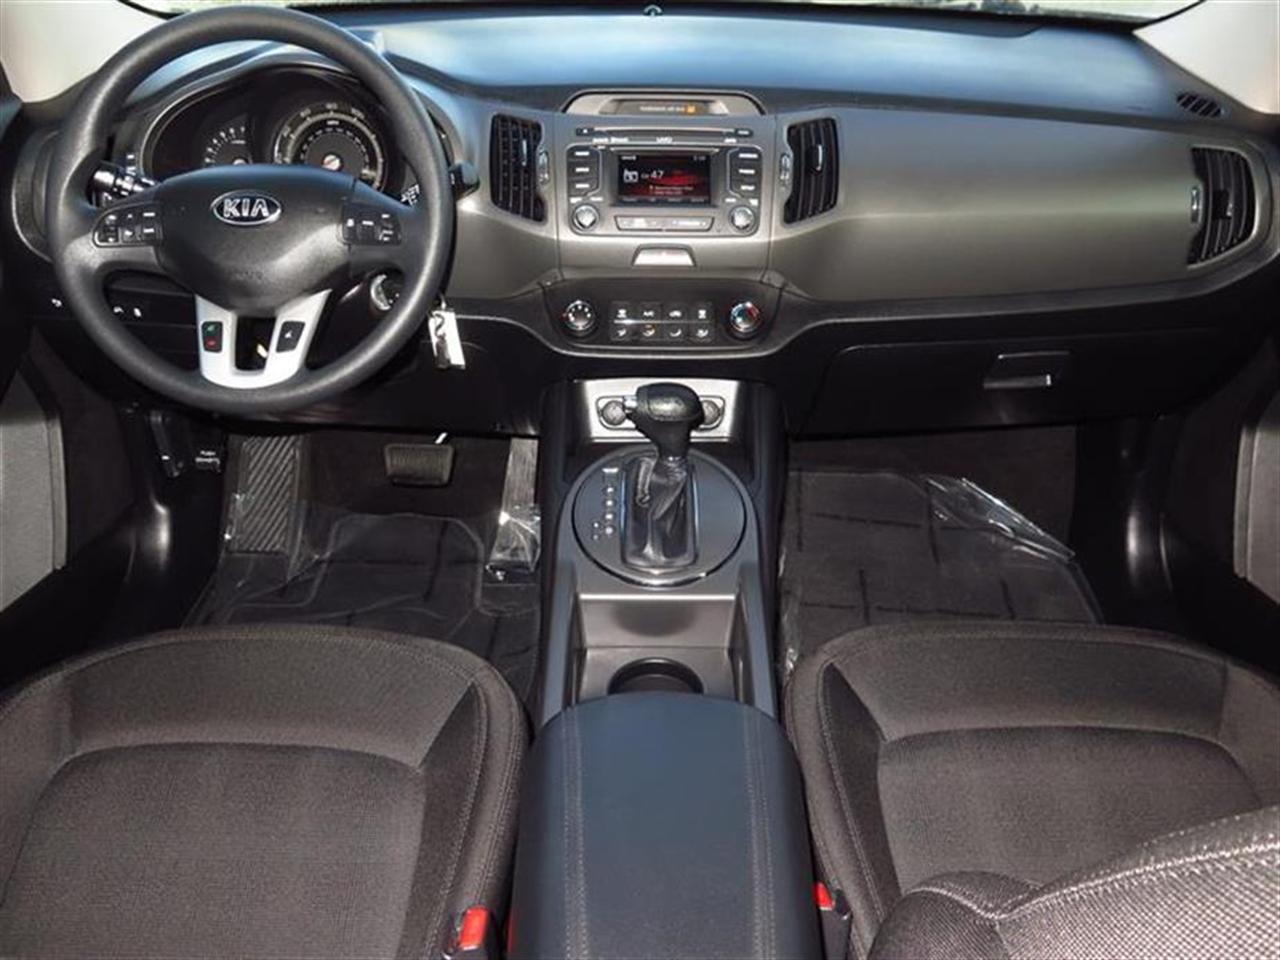 2013 KIA SPORTAGE 2WD 4dr LX 19612 miles 12V pwr outlet 6040 split-folding rear seat warmrest